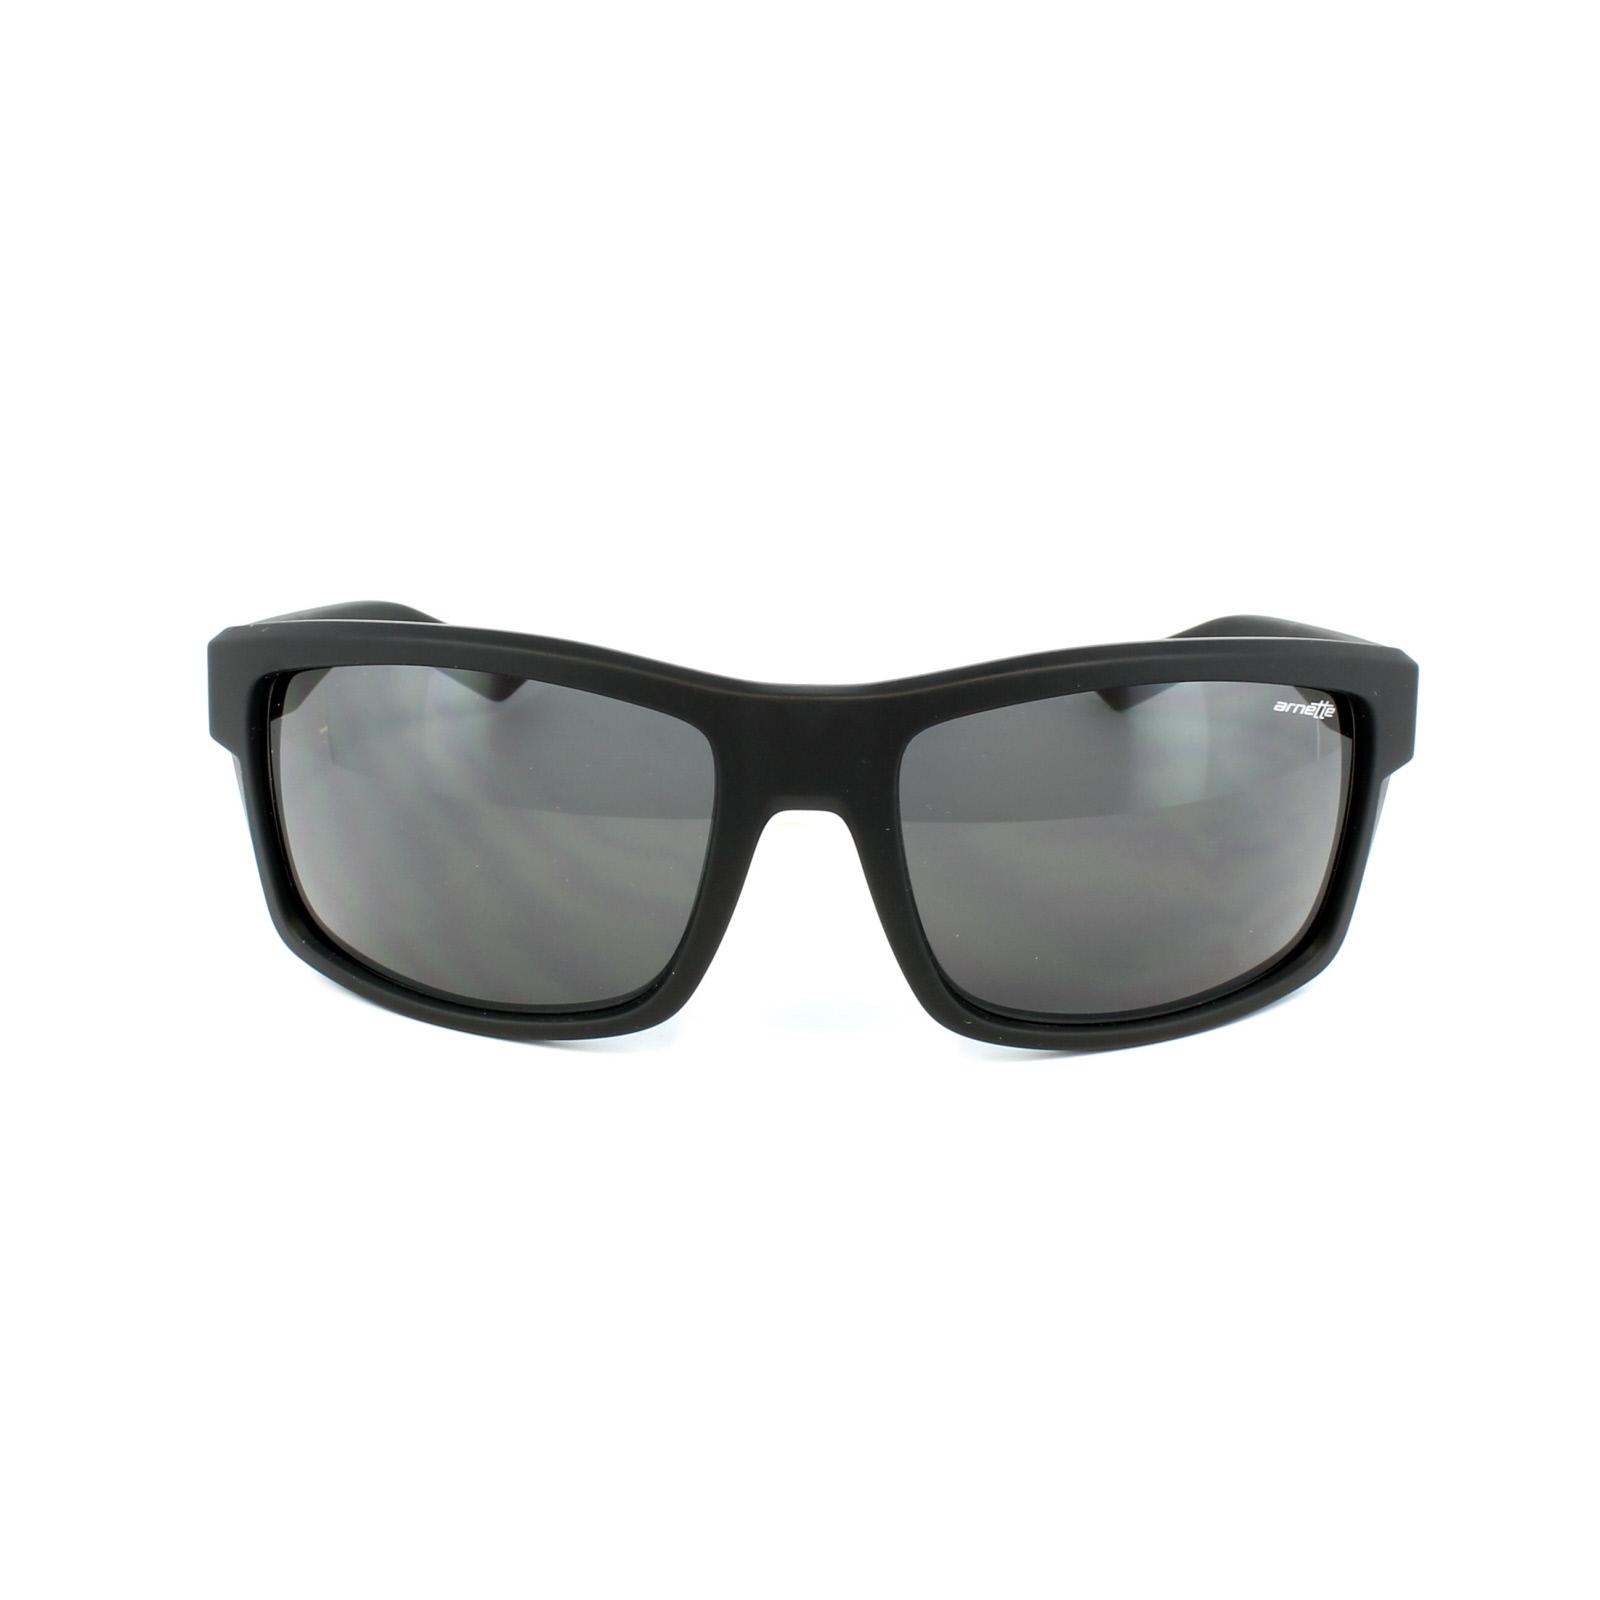 f67eed4416 Sentinel Arnette Sunglasses 4216 Corner Man 447 87 Black Dark Grey